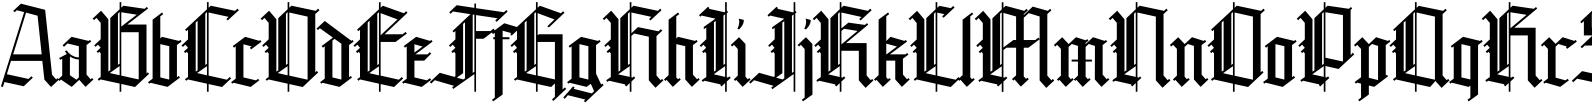 Grandice